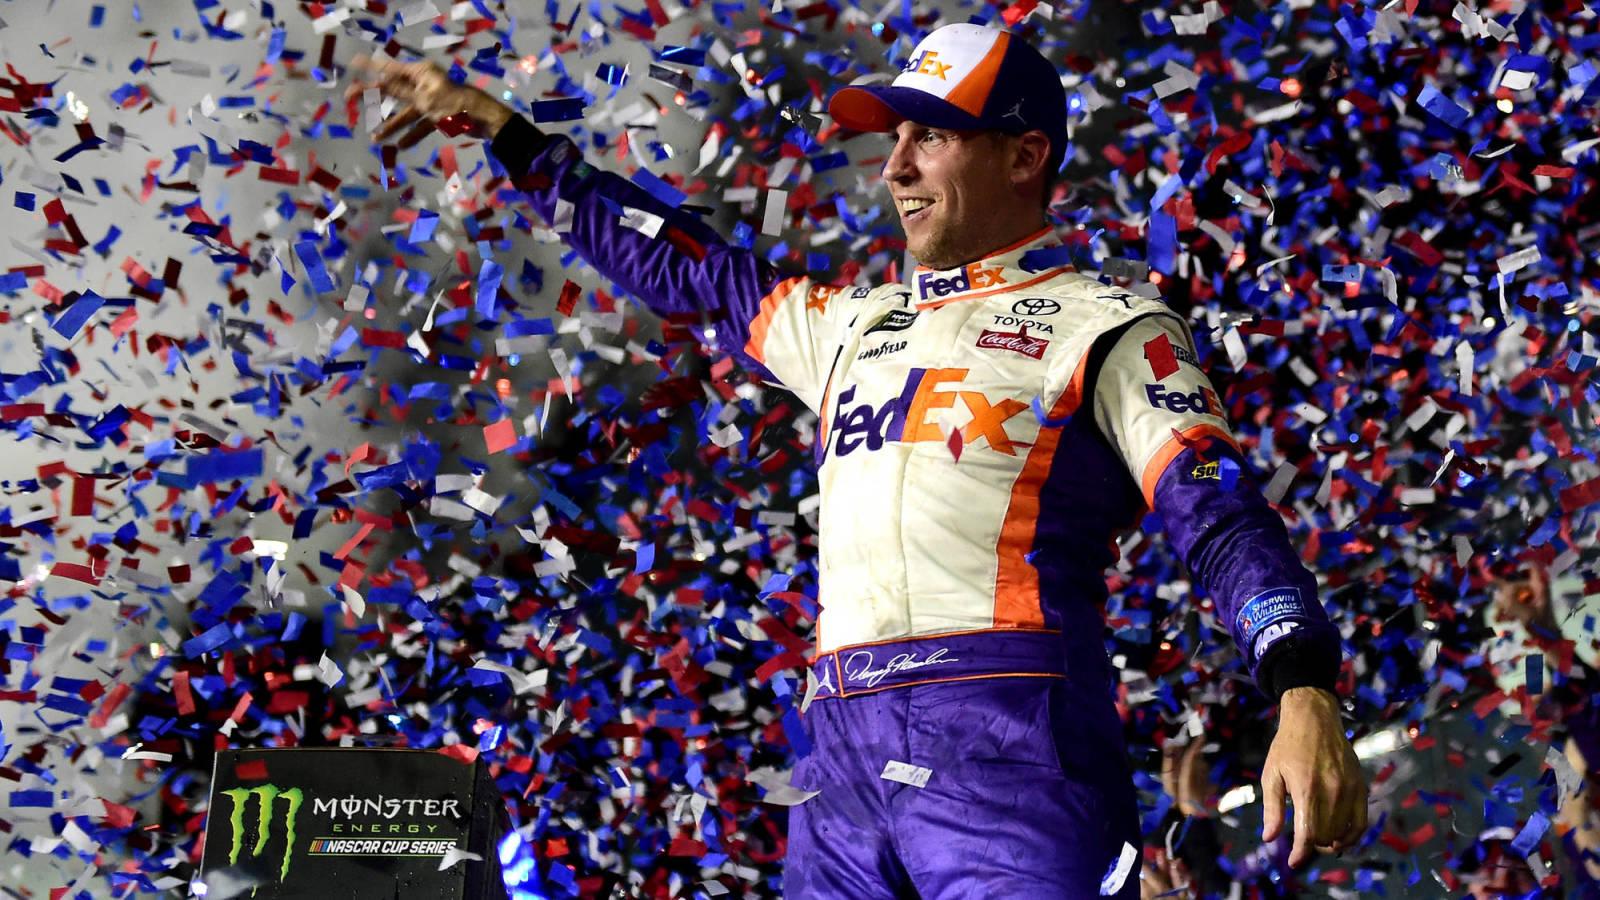 Who won the Daytona 500 winner the year you were born?